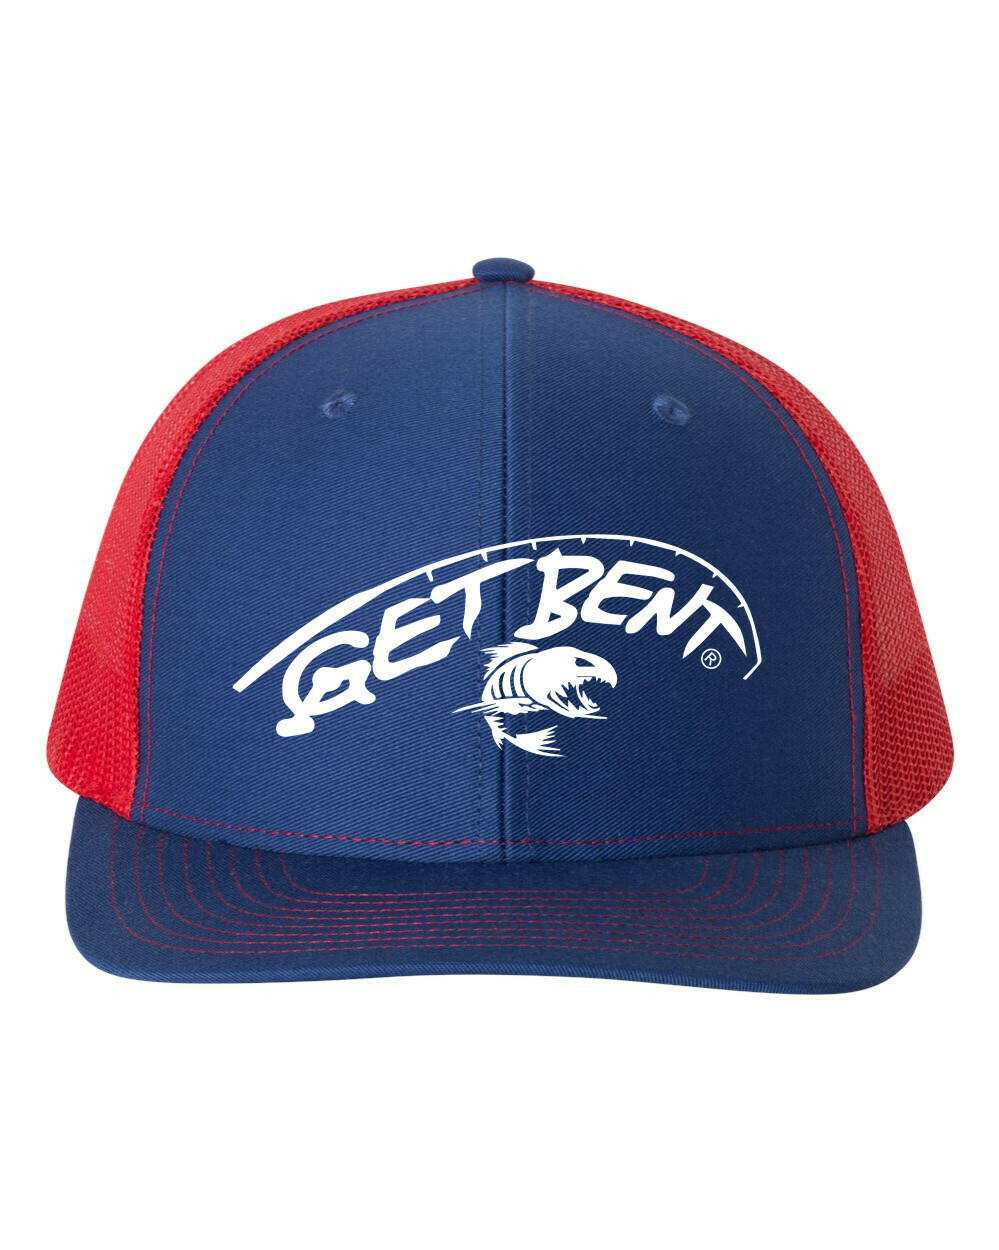 'Get Bent' - Richardson Trucker - Royal/Red